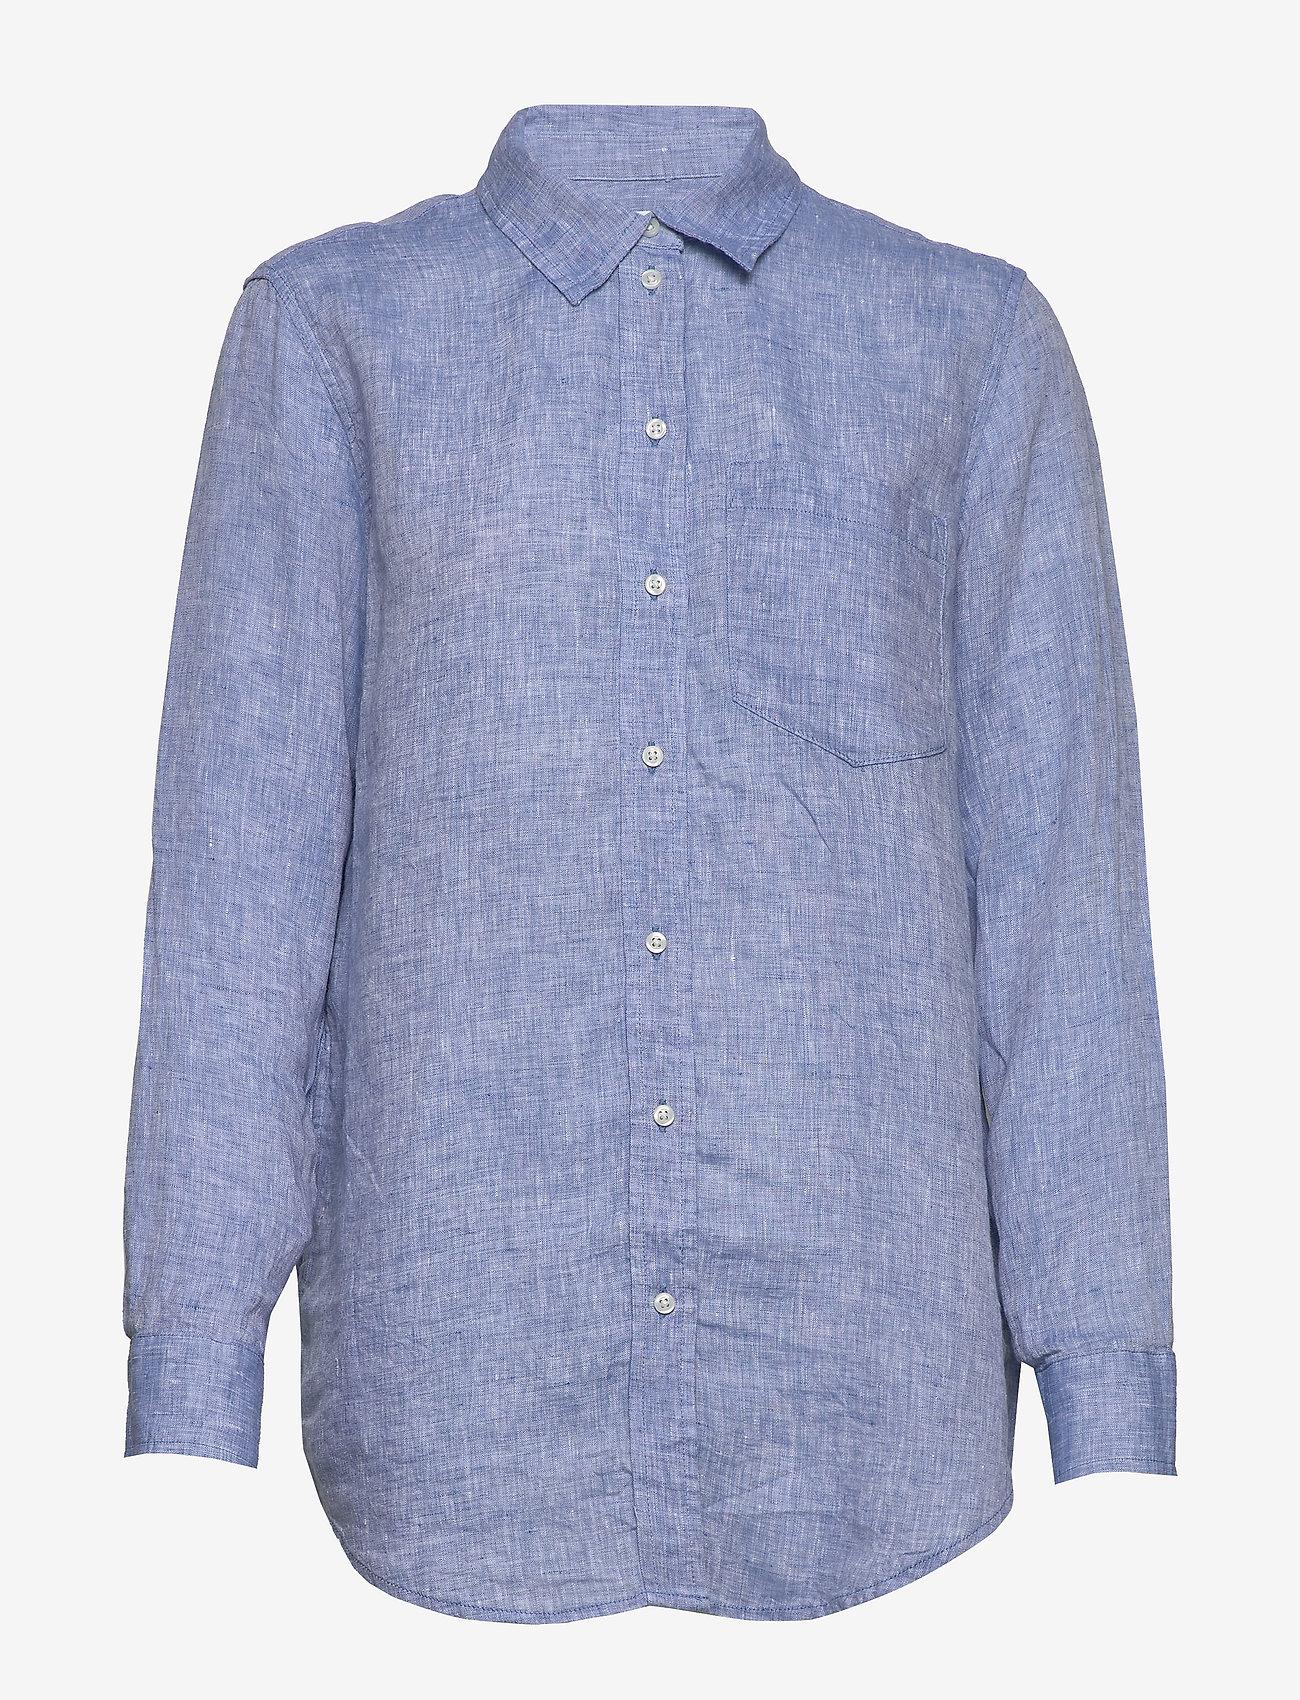 Gap Boyfriend Shirt In Linen - Blusar & Skjortor Light Blue